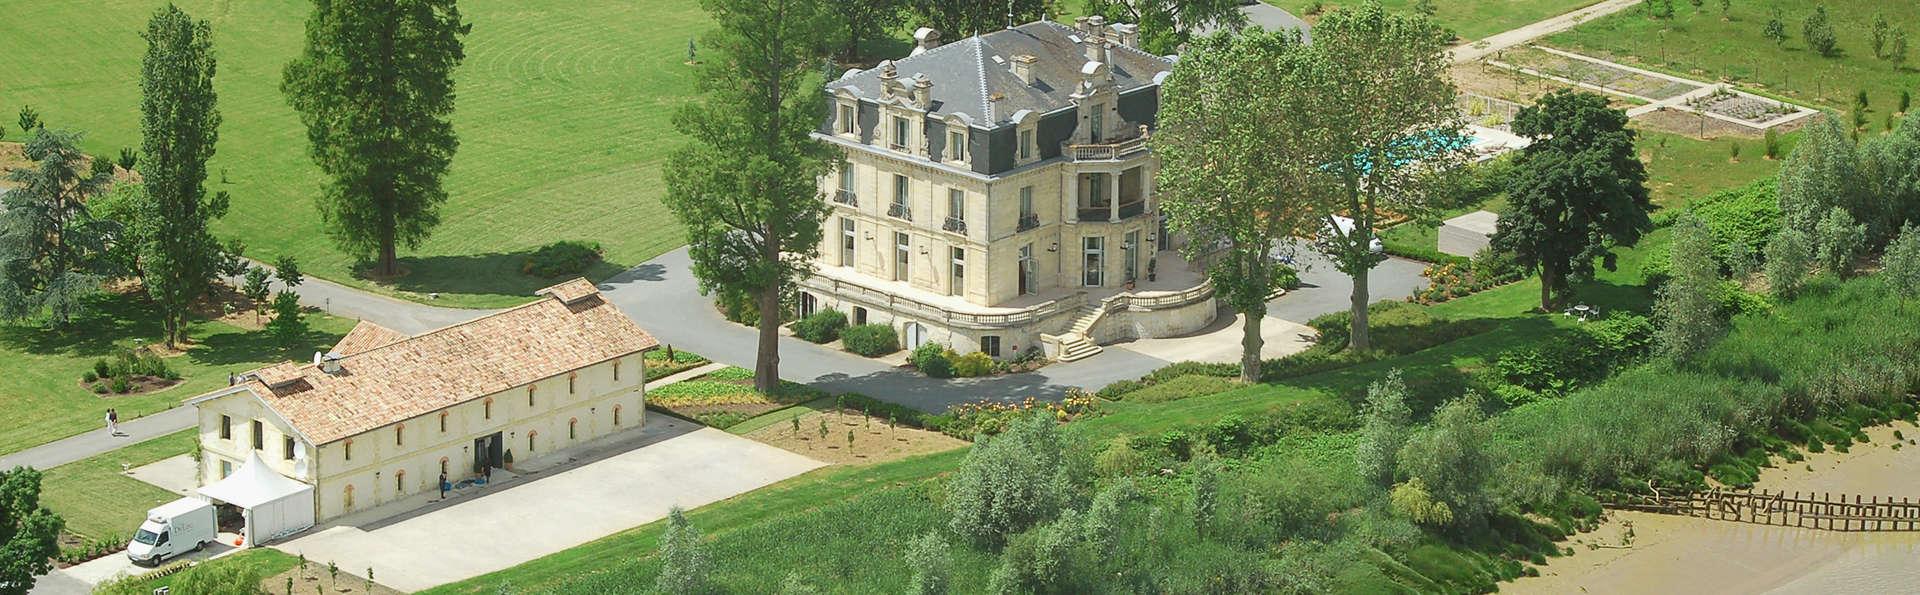 Château Grattequina - EDIT_Facada_2.jpg